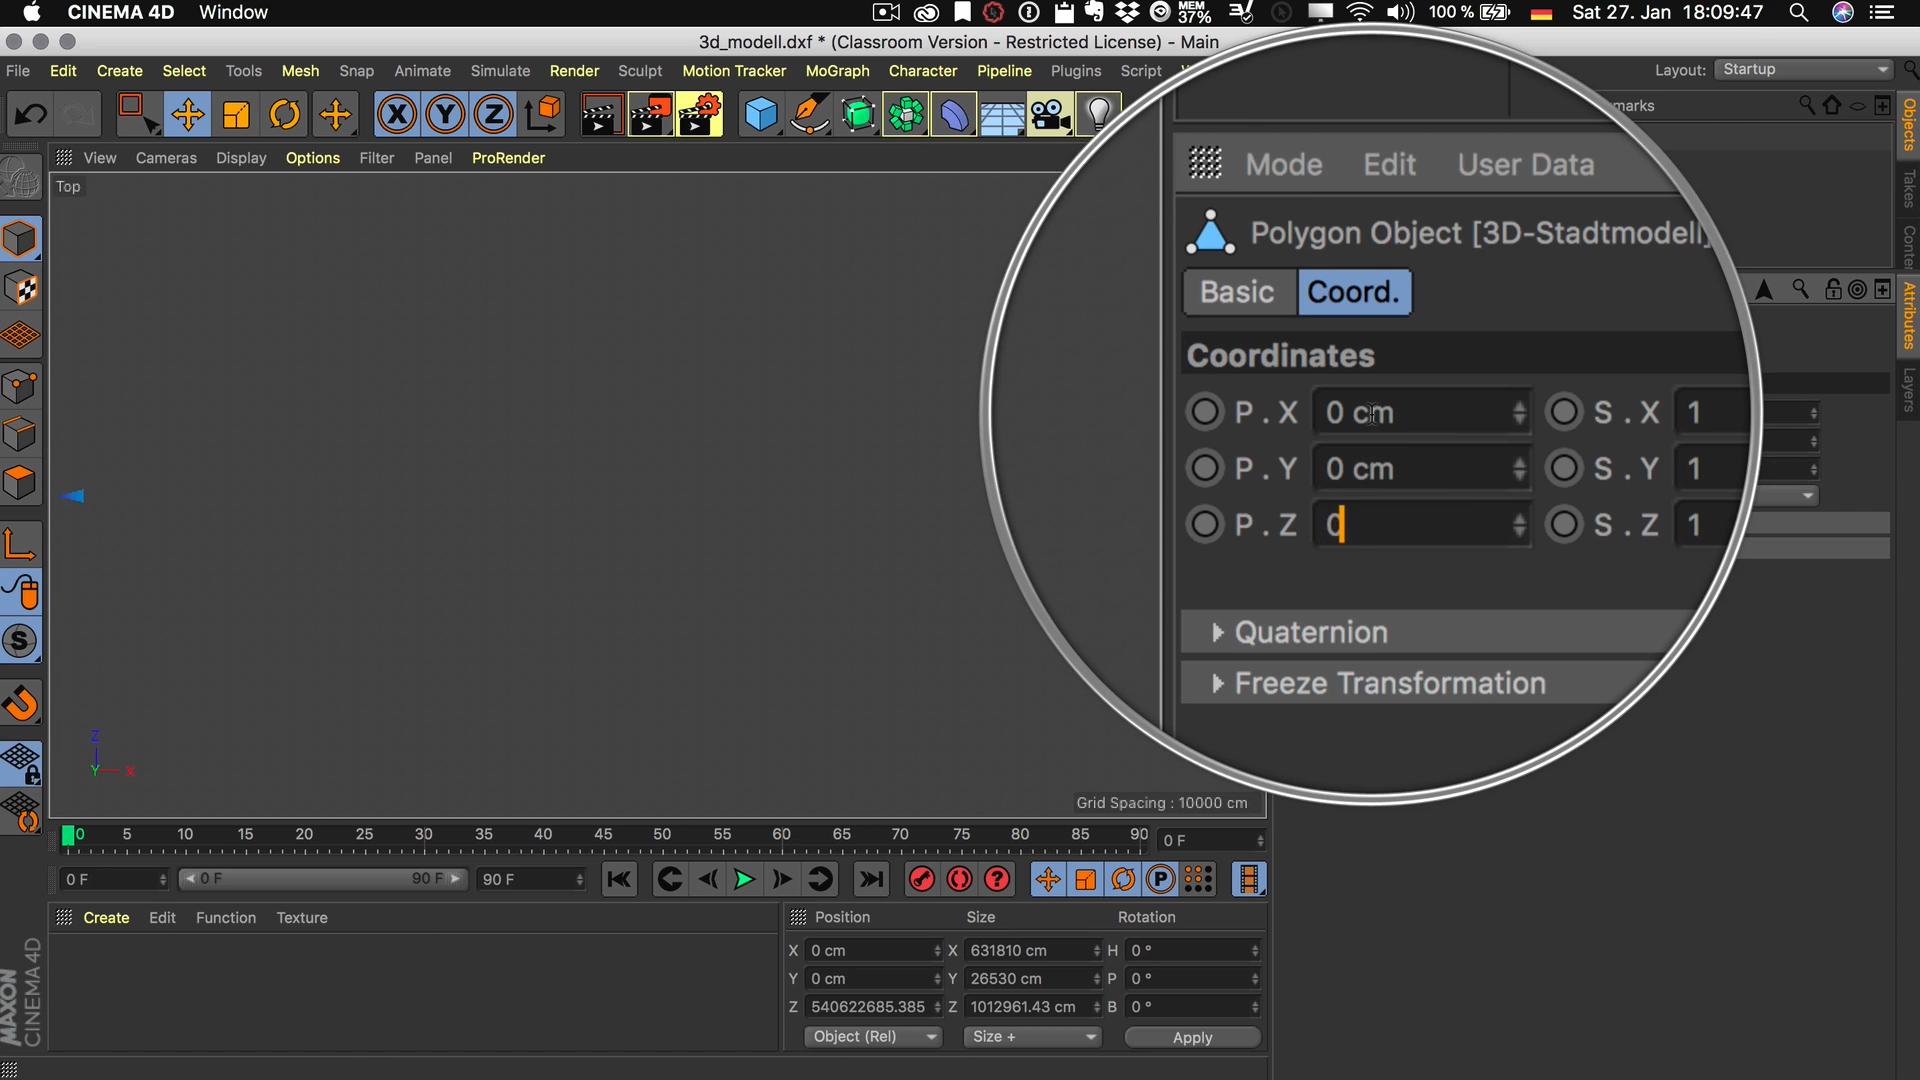 Cinema4D 3D-Stadtmodell Position Modell Nullpunkt Koordinaten P.X P.Y P.Z 0